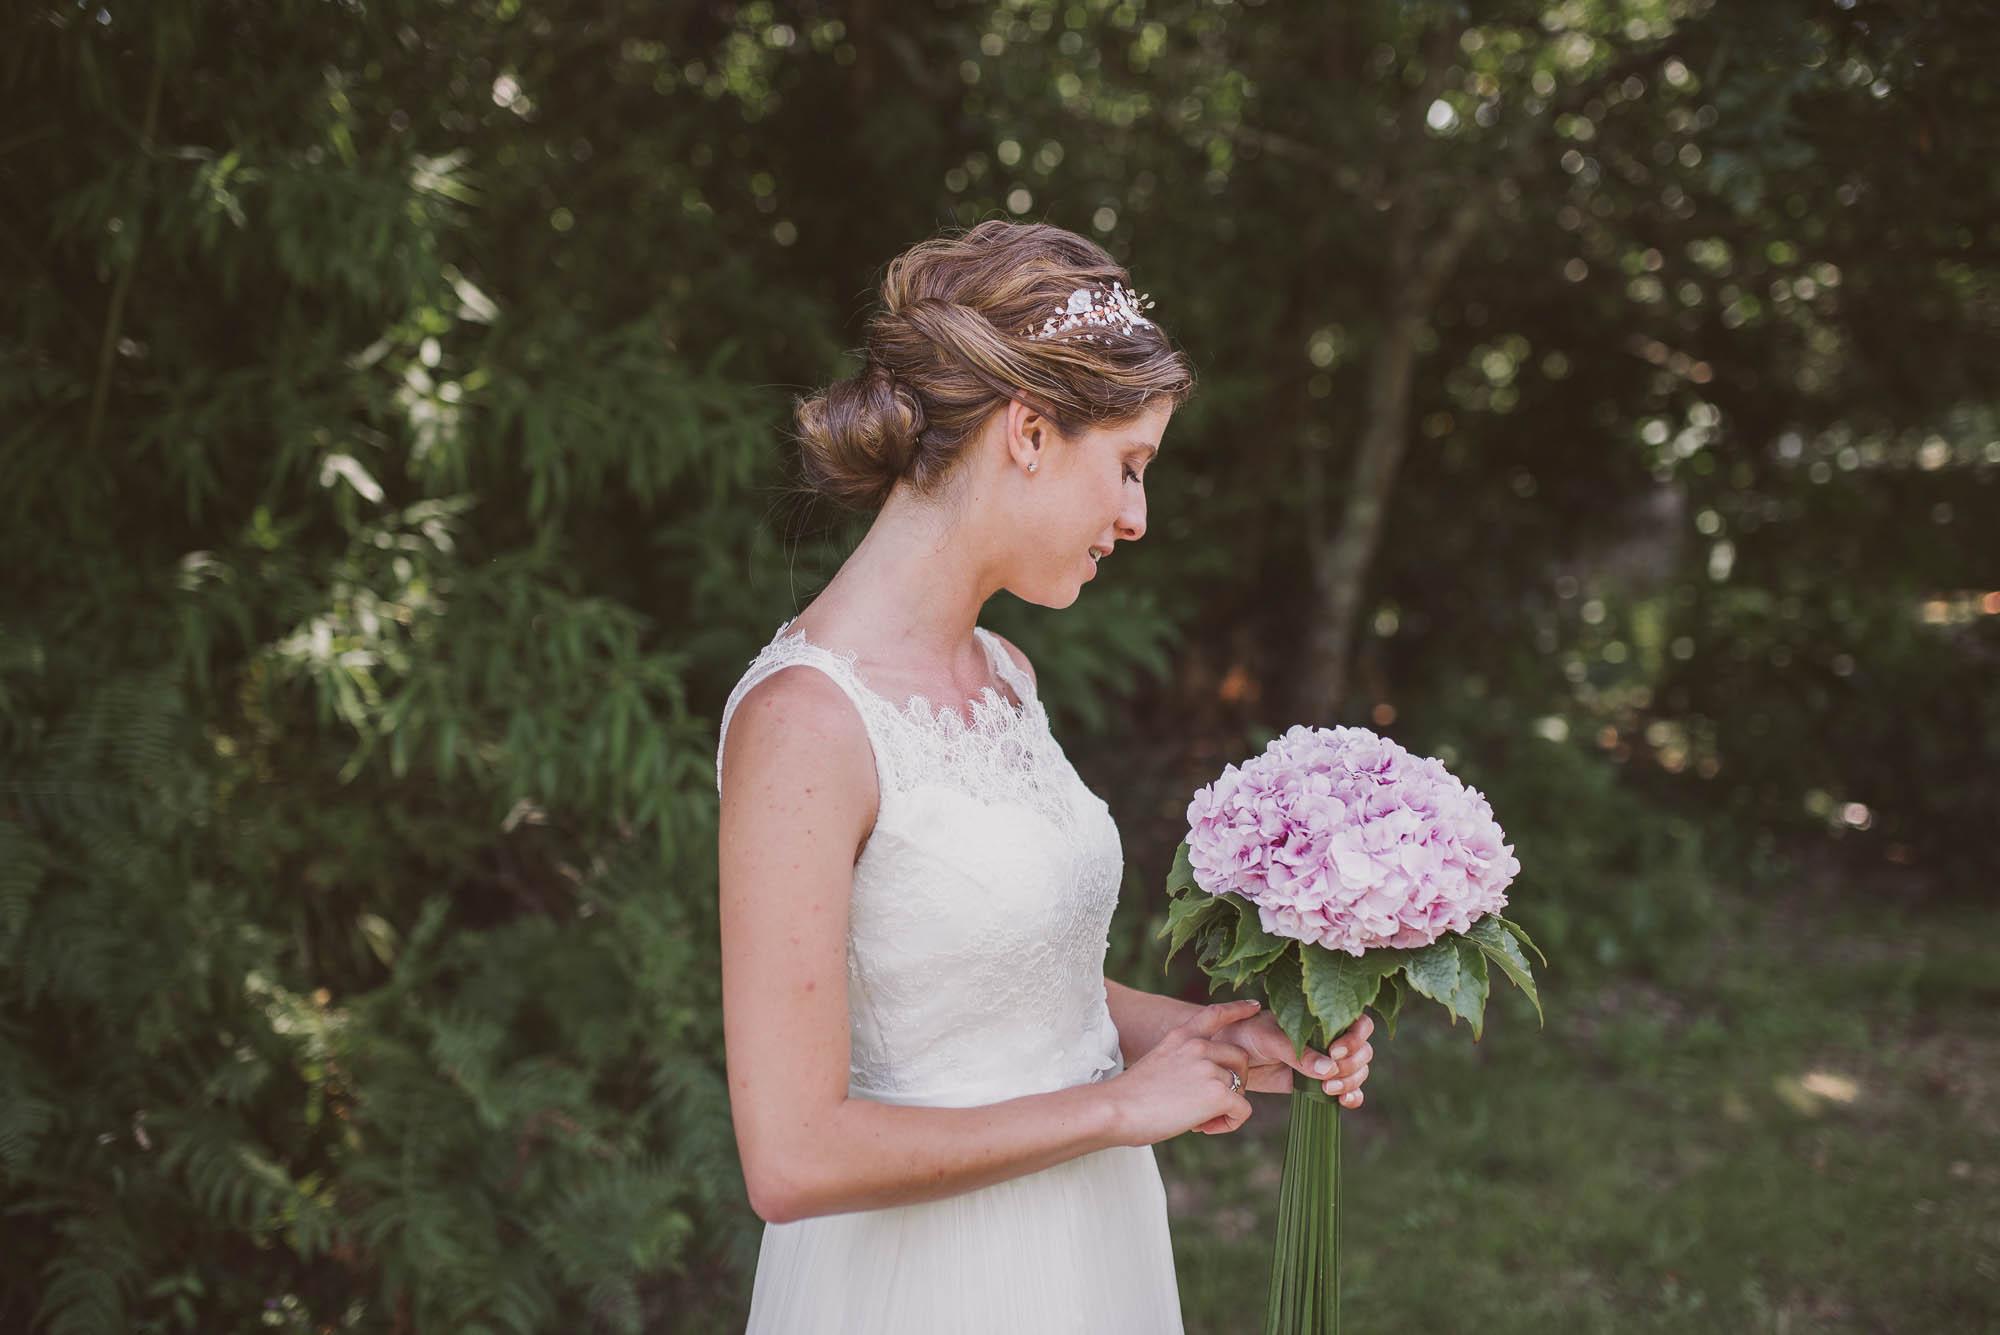 La novia después de la boda posa con su ramo